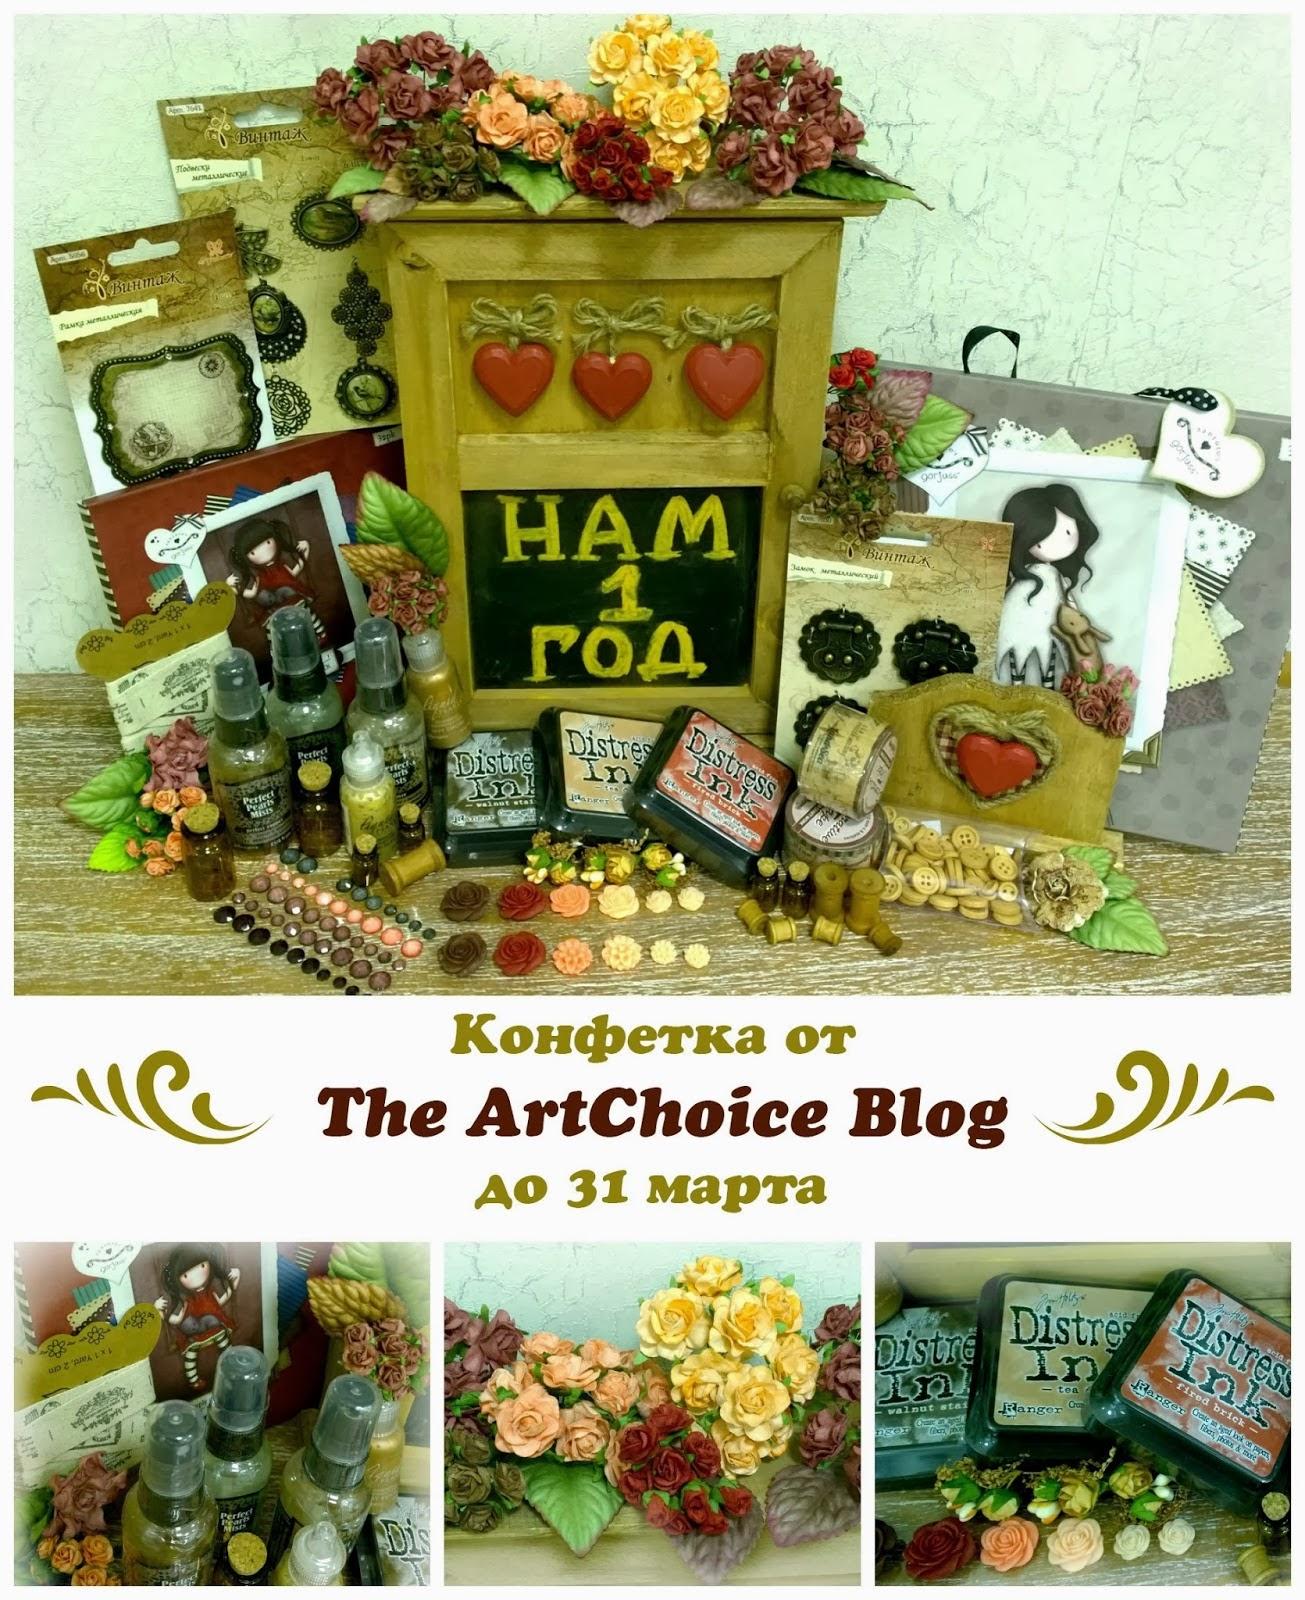 http://www.blog.artchoice.ru/2014/03/blog-post_8.html